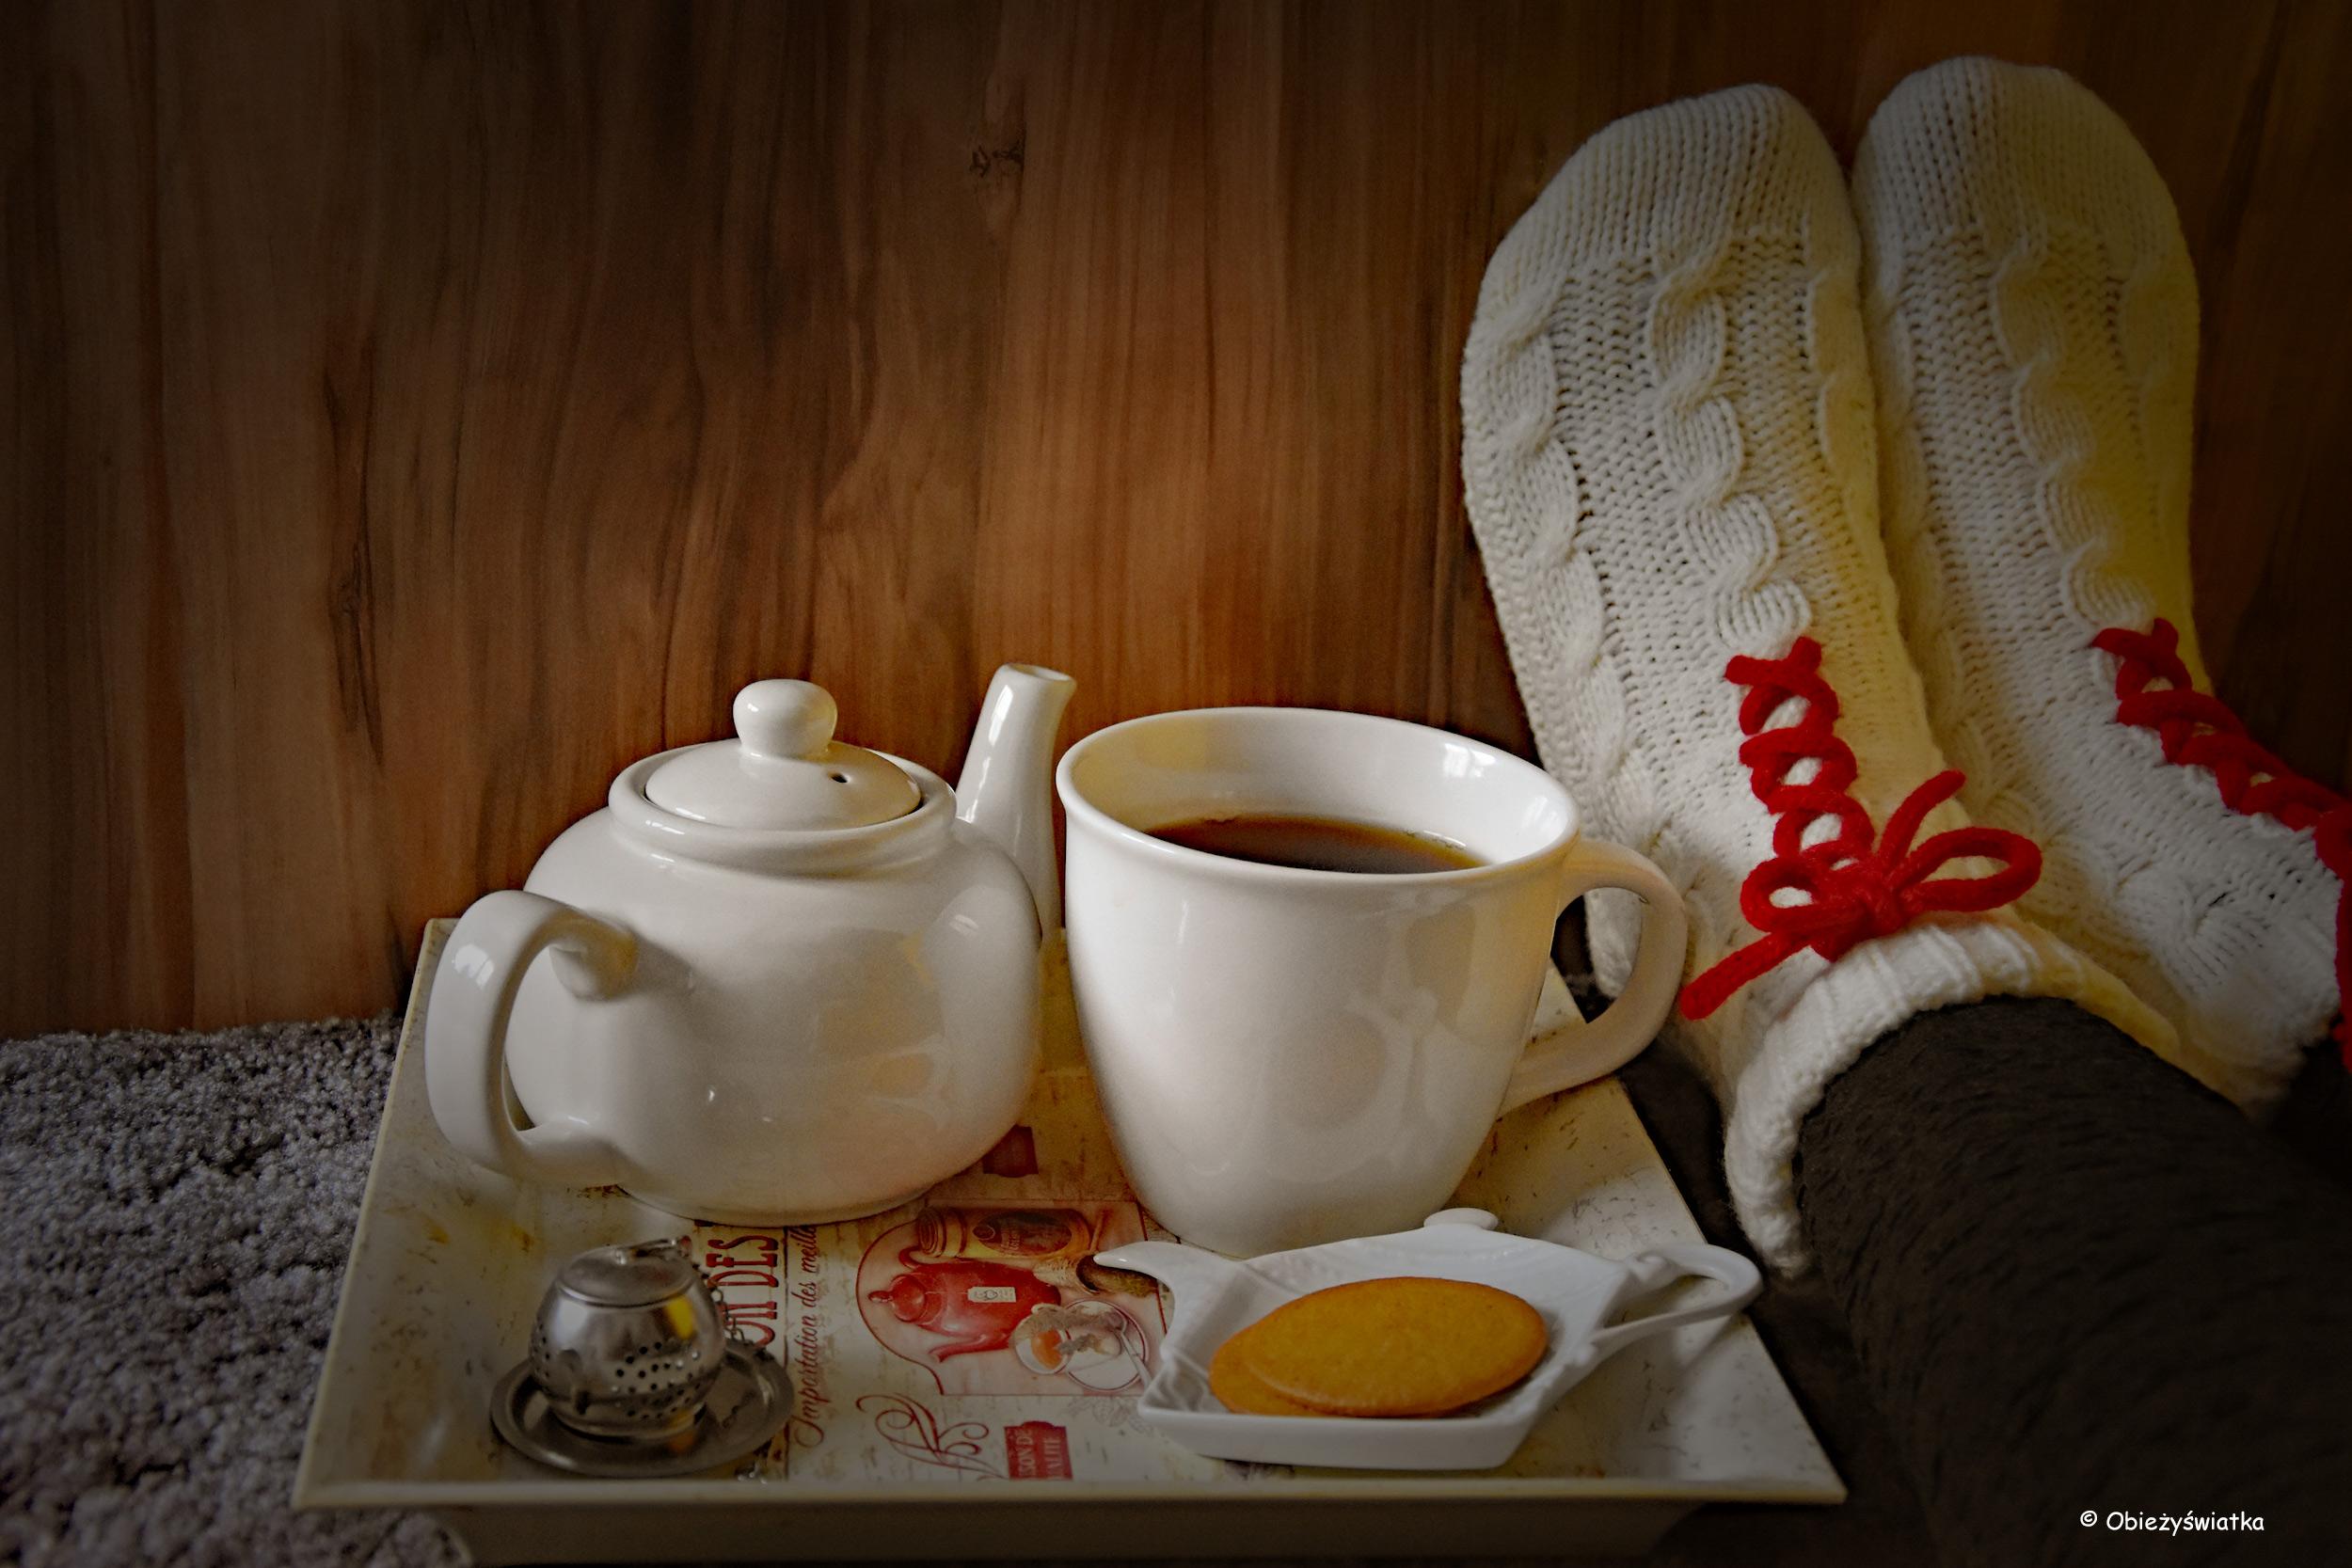 Dobra herbata, ciasteczka i ciepłe skarpetki - pomysł na zimowe popołudnie